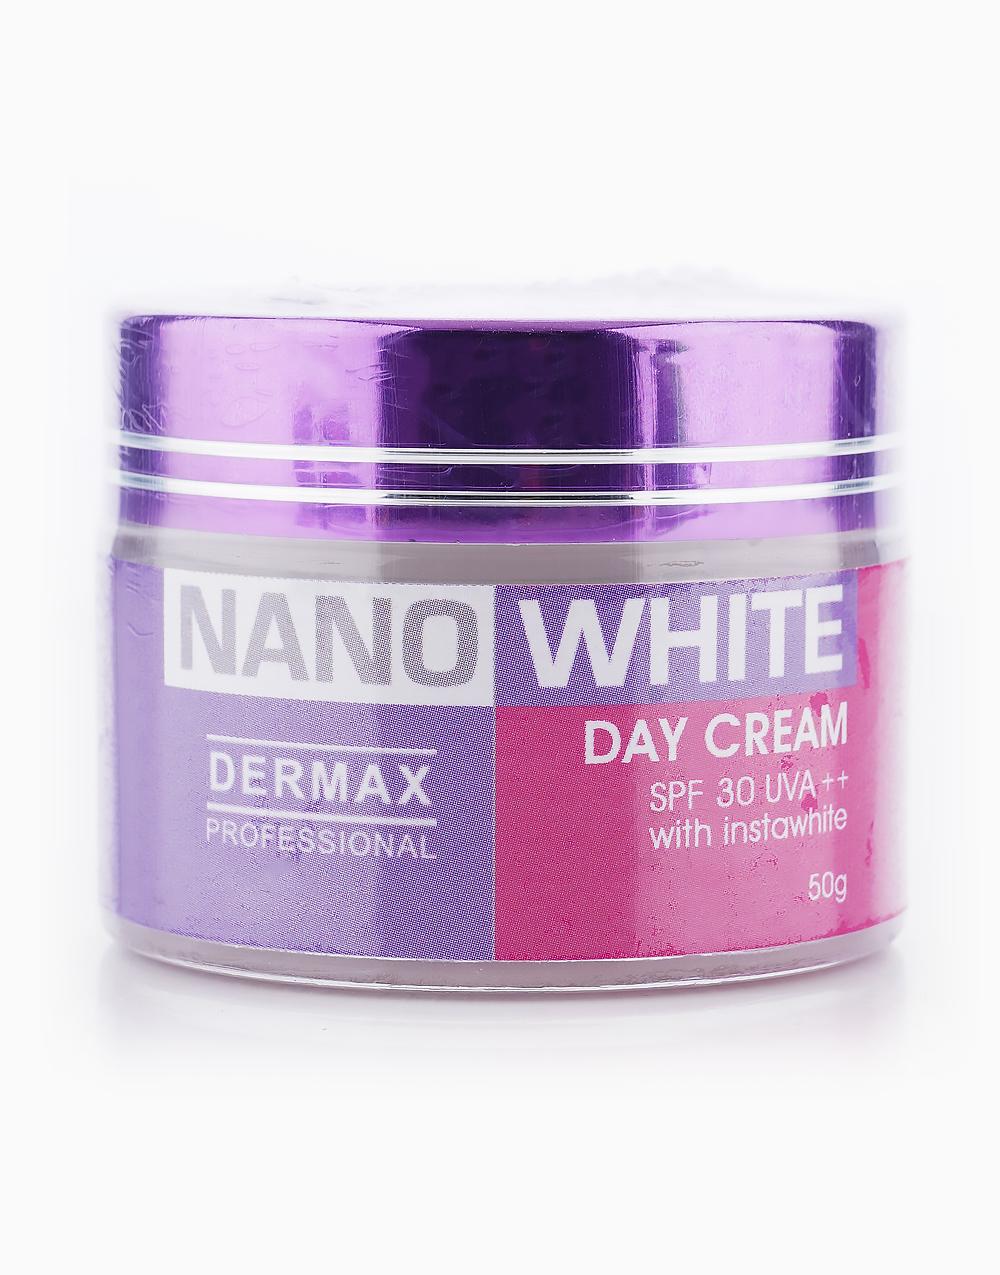 NanoWhite Day Cream with SPF 30 UVA +++ (50g) by Dermax Professional